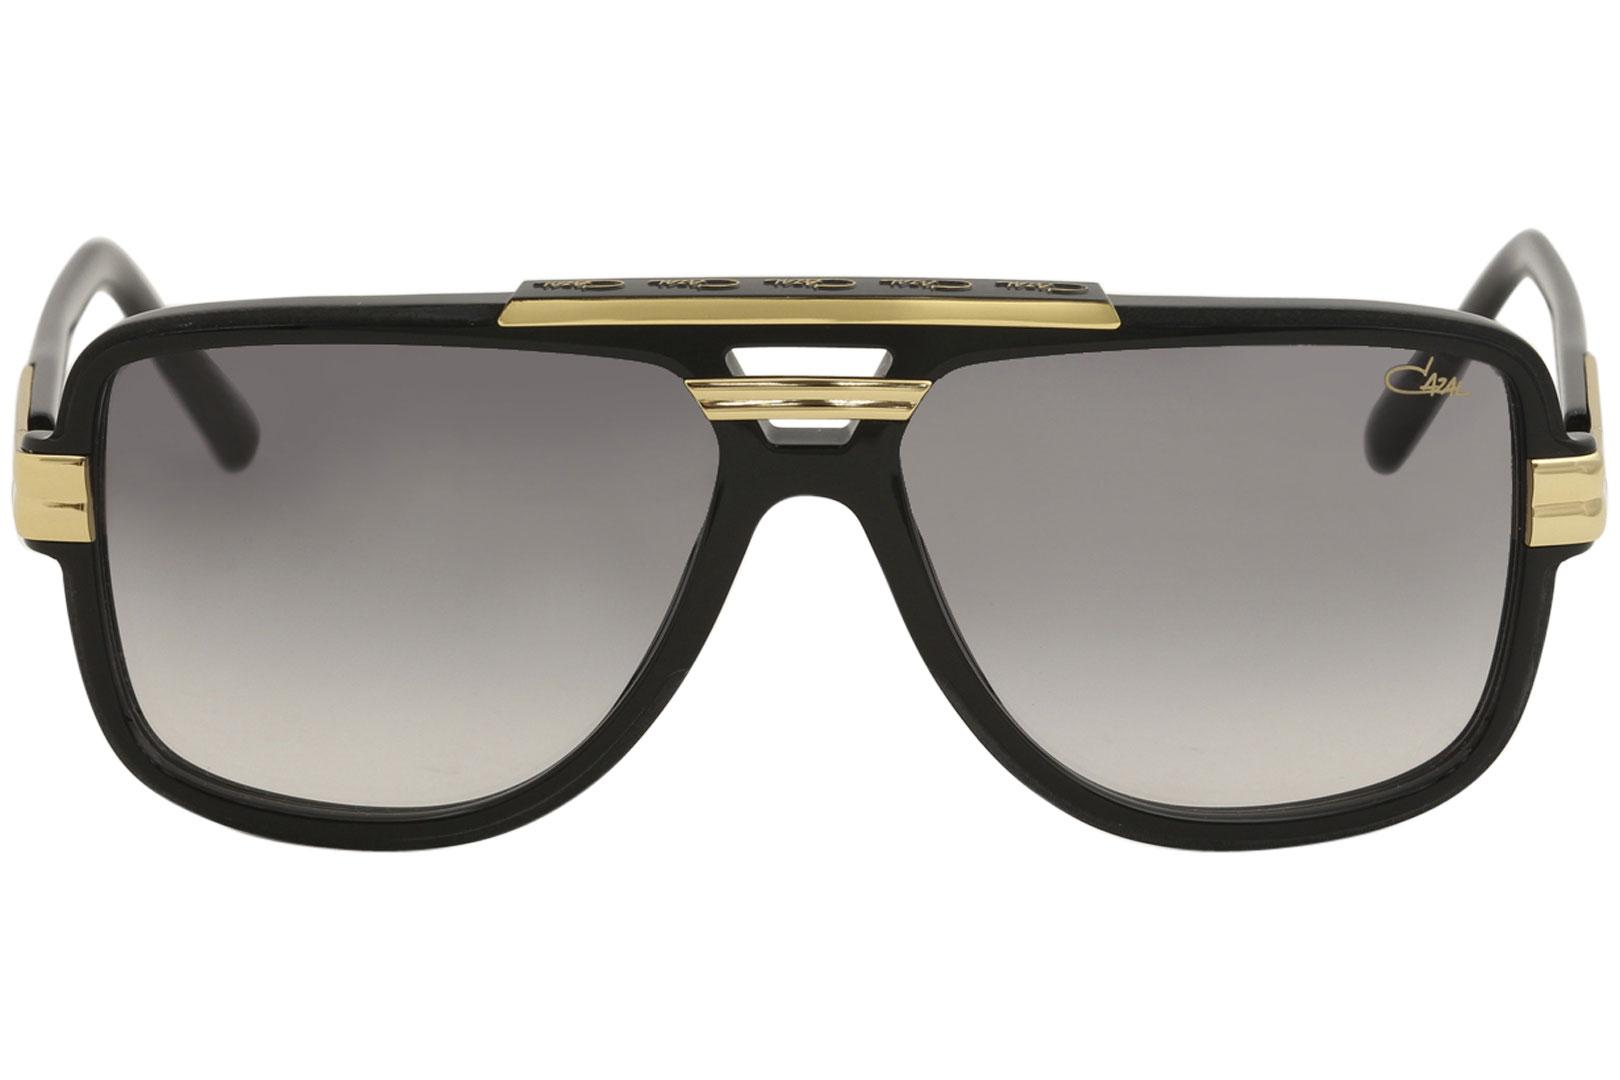 f2185c64680 ... Retro Pilot Sunglasses by Cazal Legends. 12345